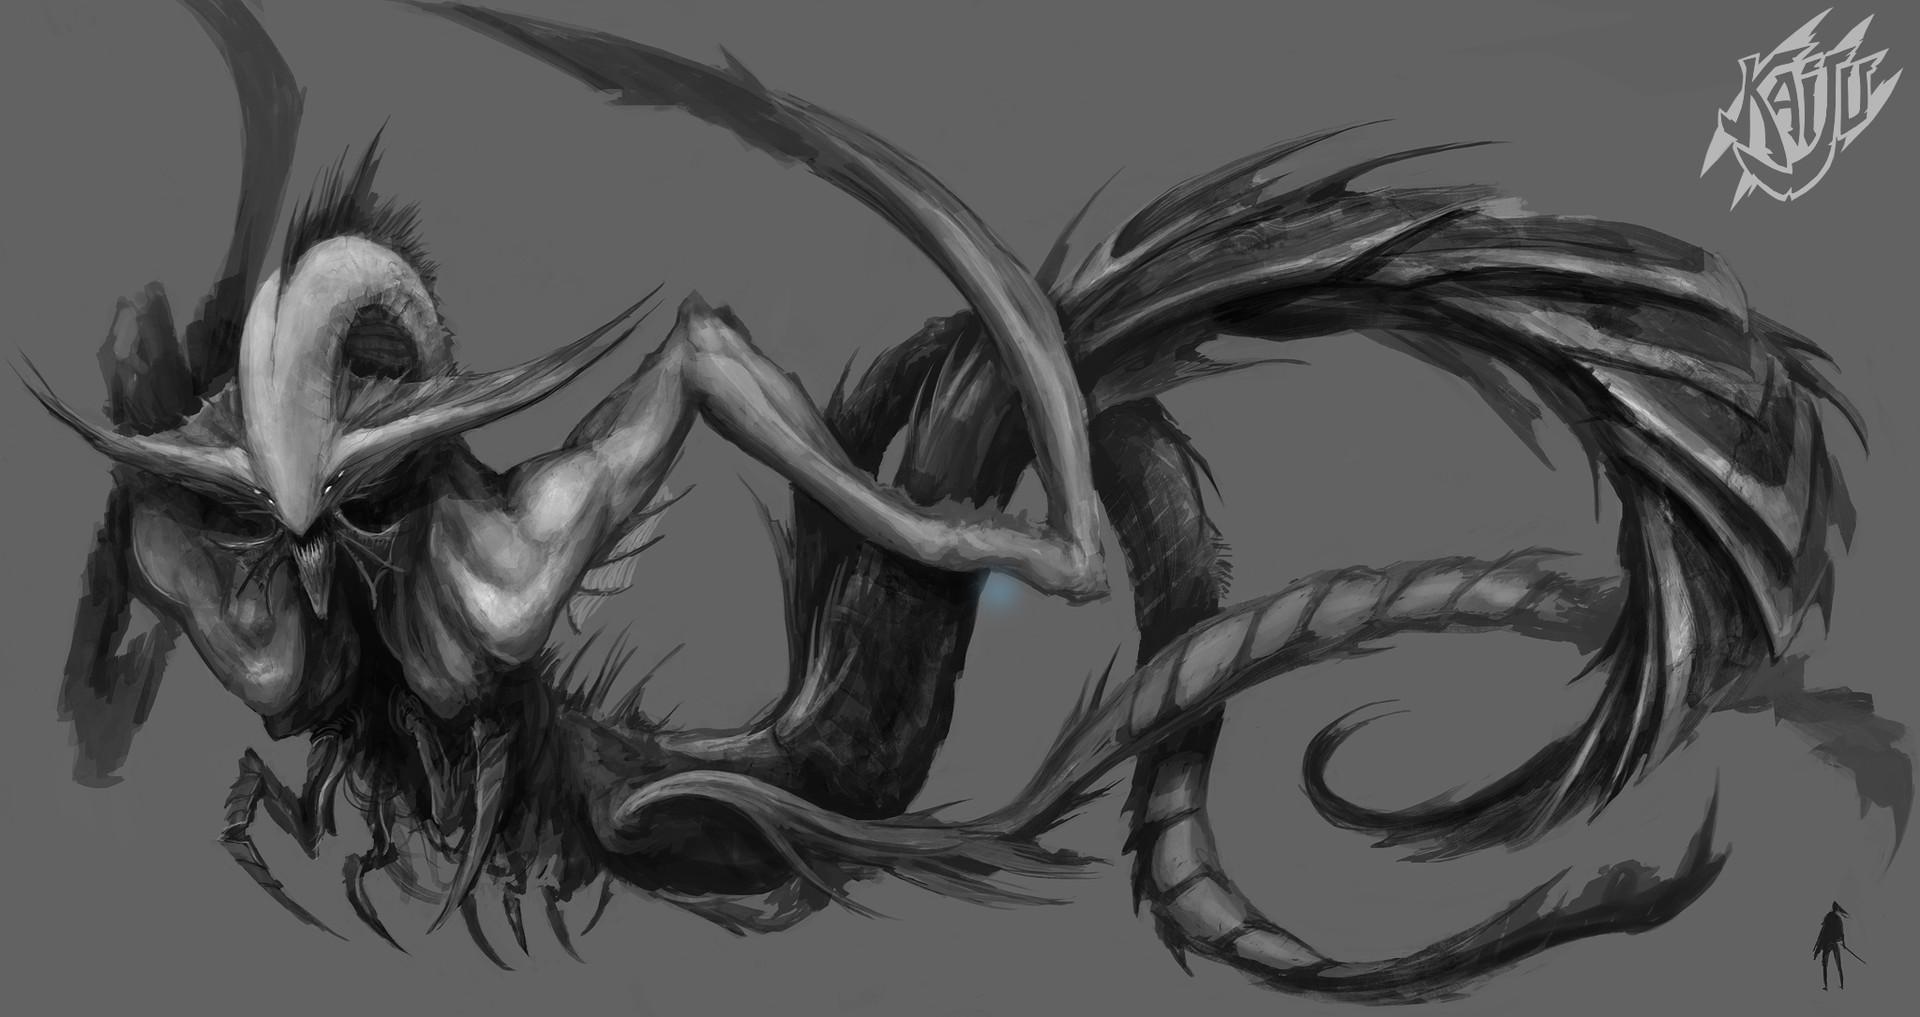 Alexandre chaudret kaijus creature predator09